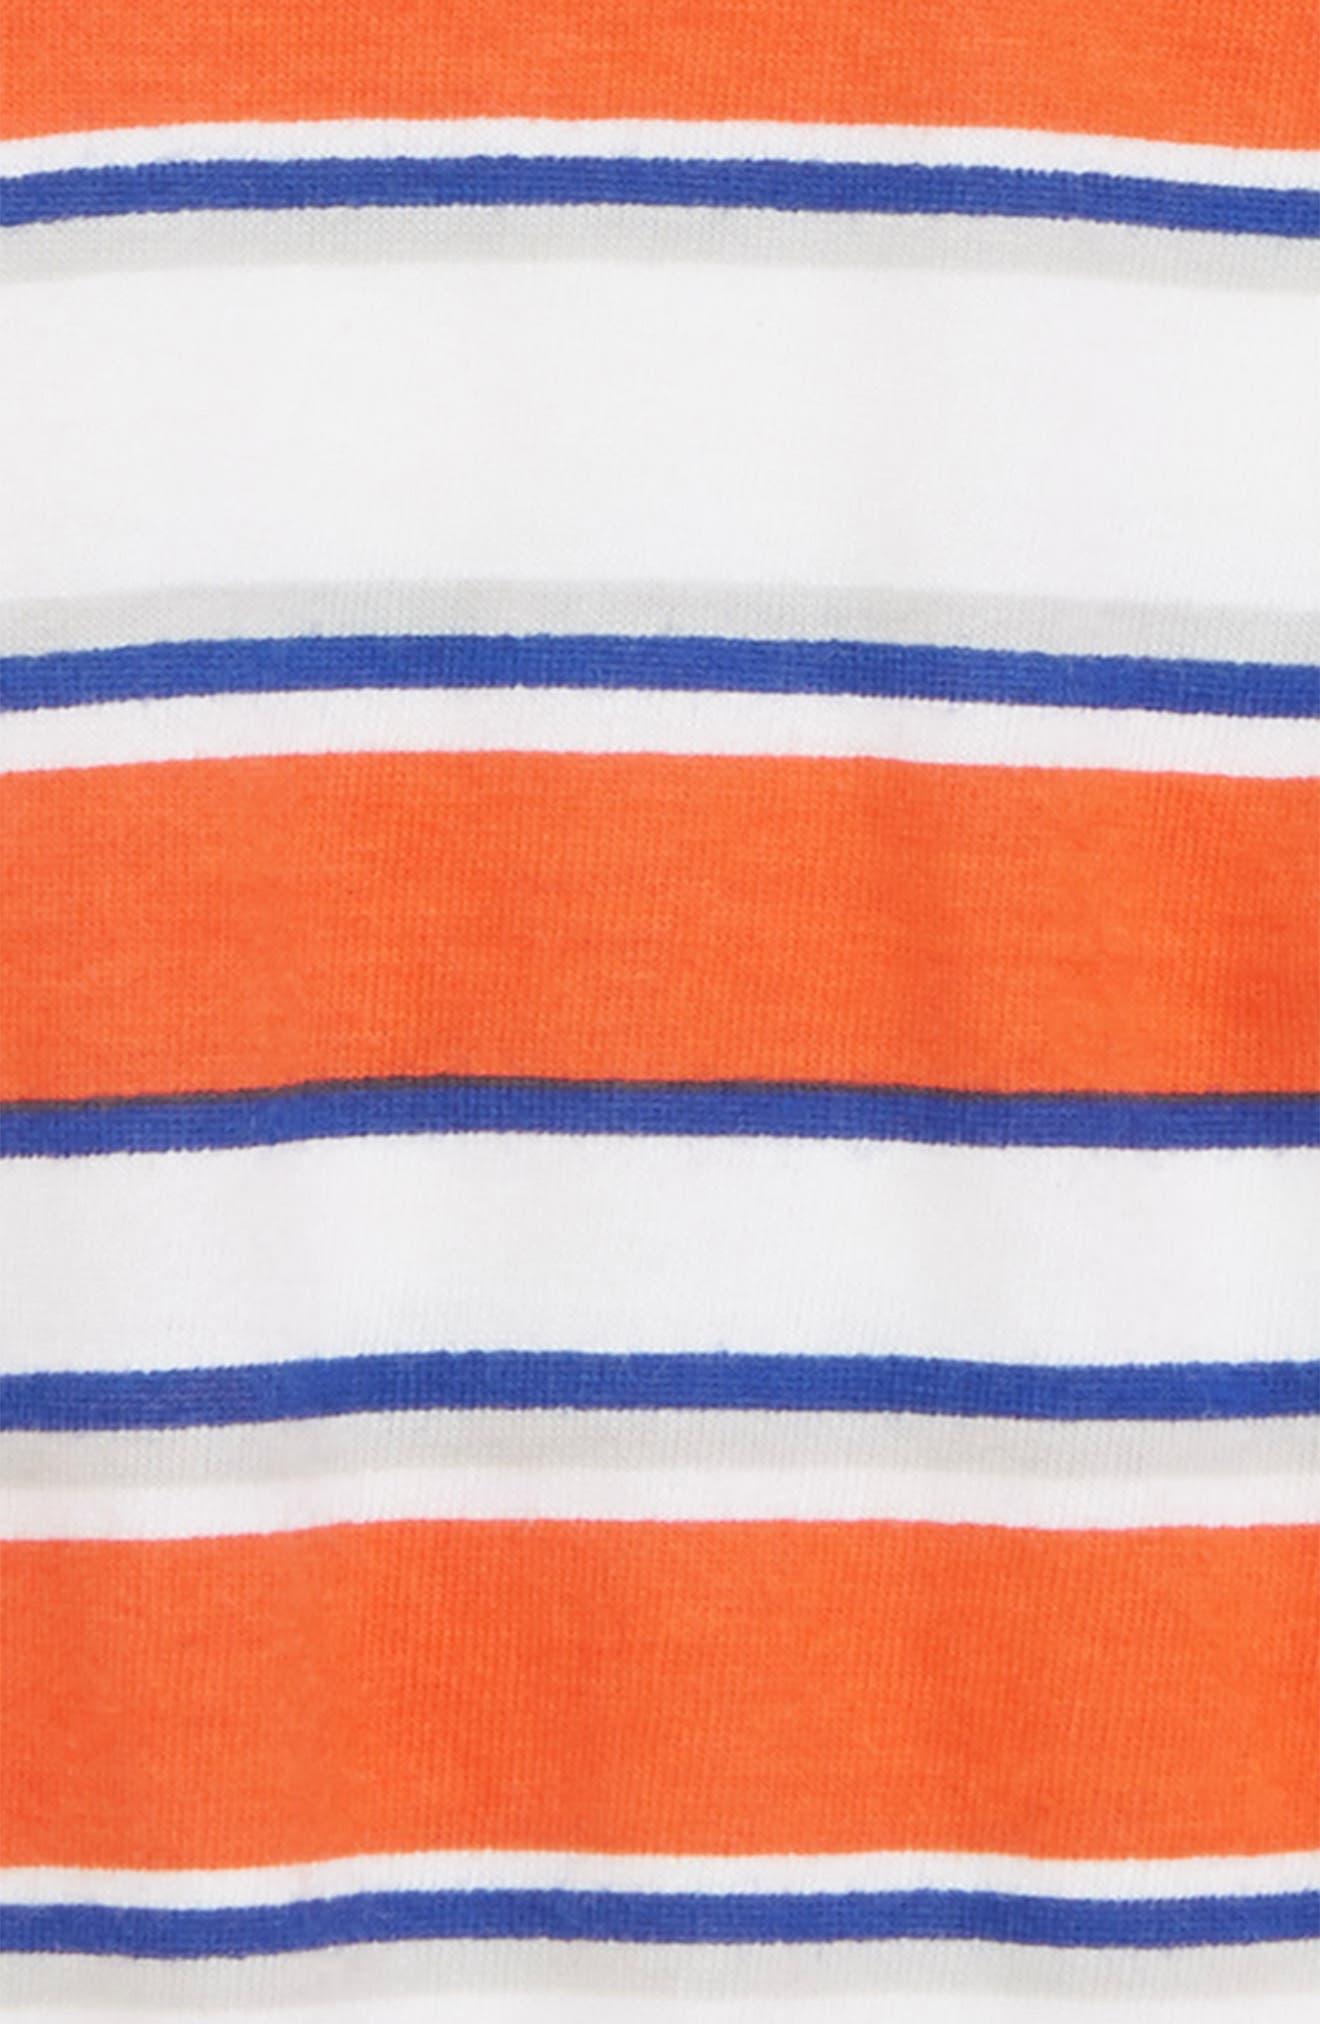 Stripe Romper,                             Alternate thumbnail 2, color,                             800